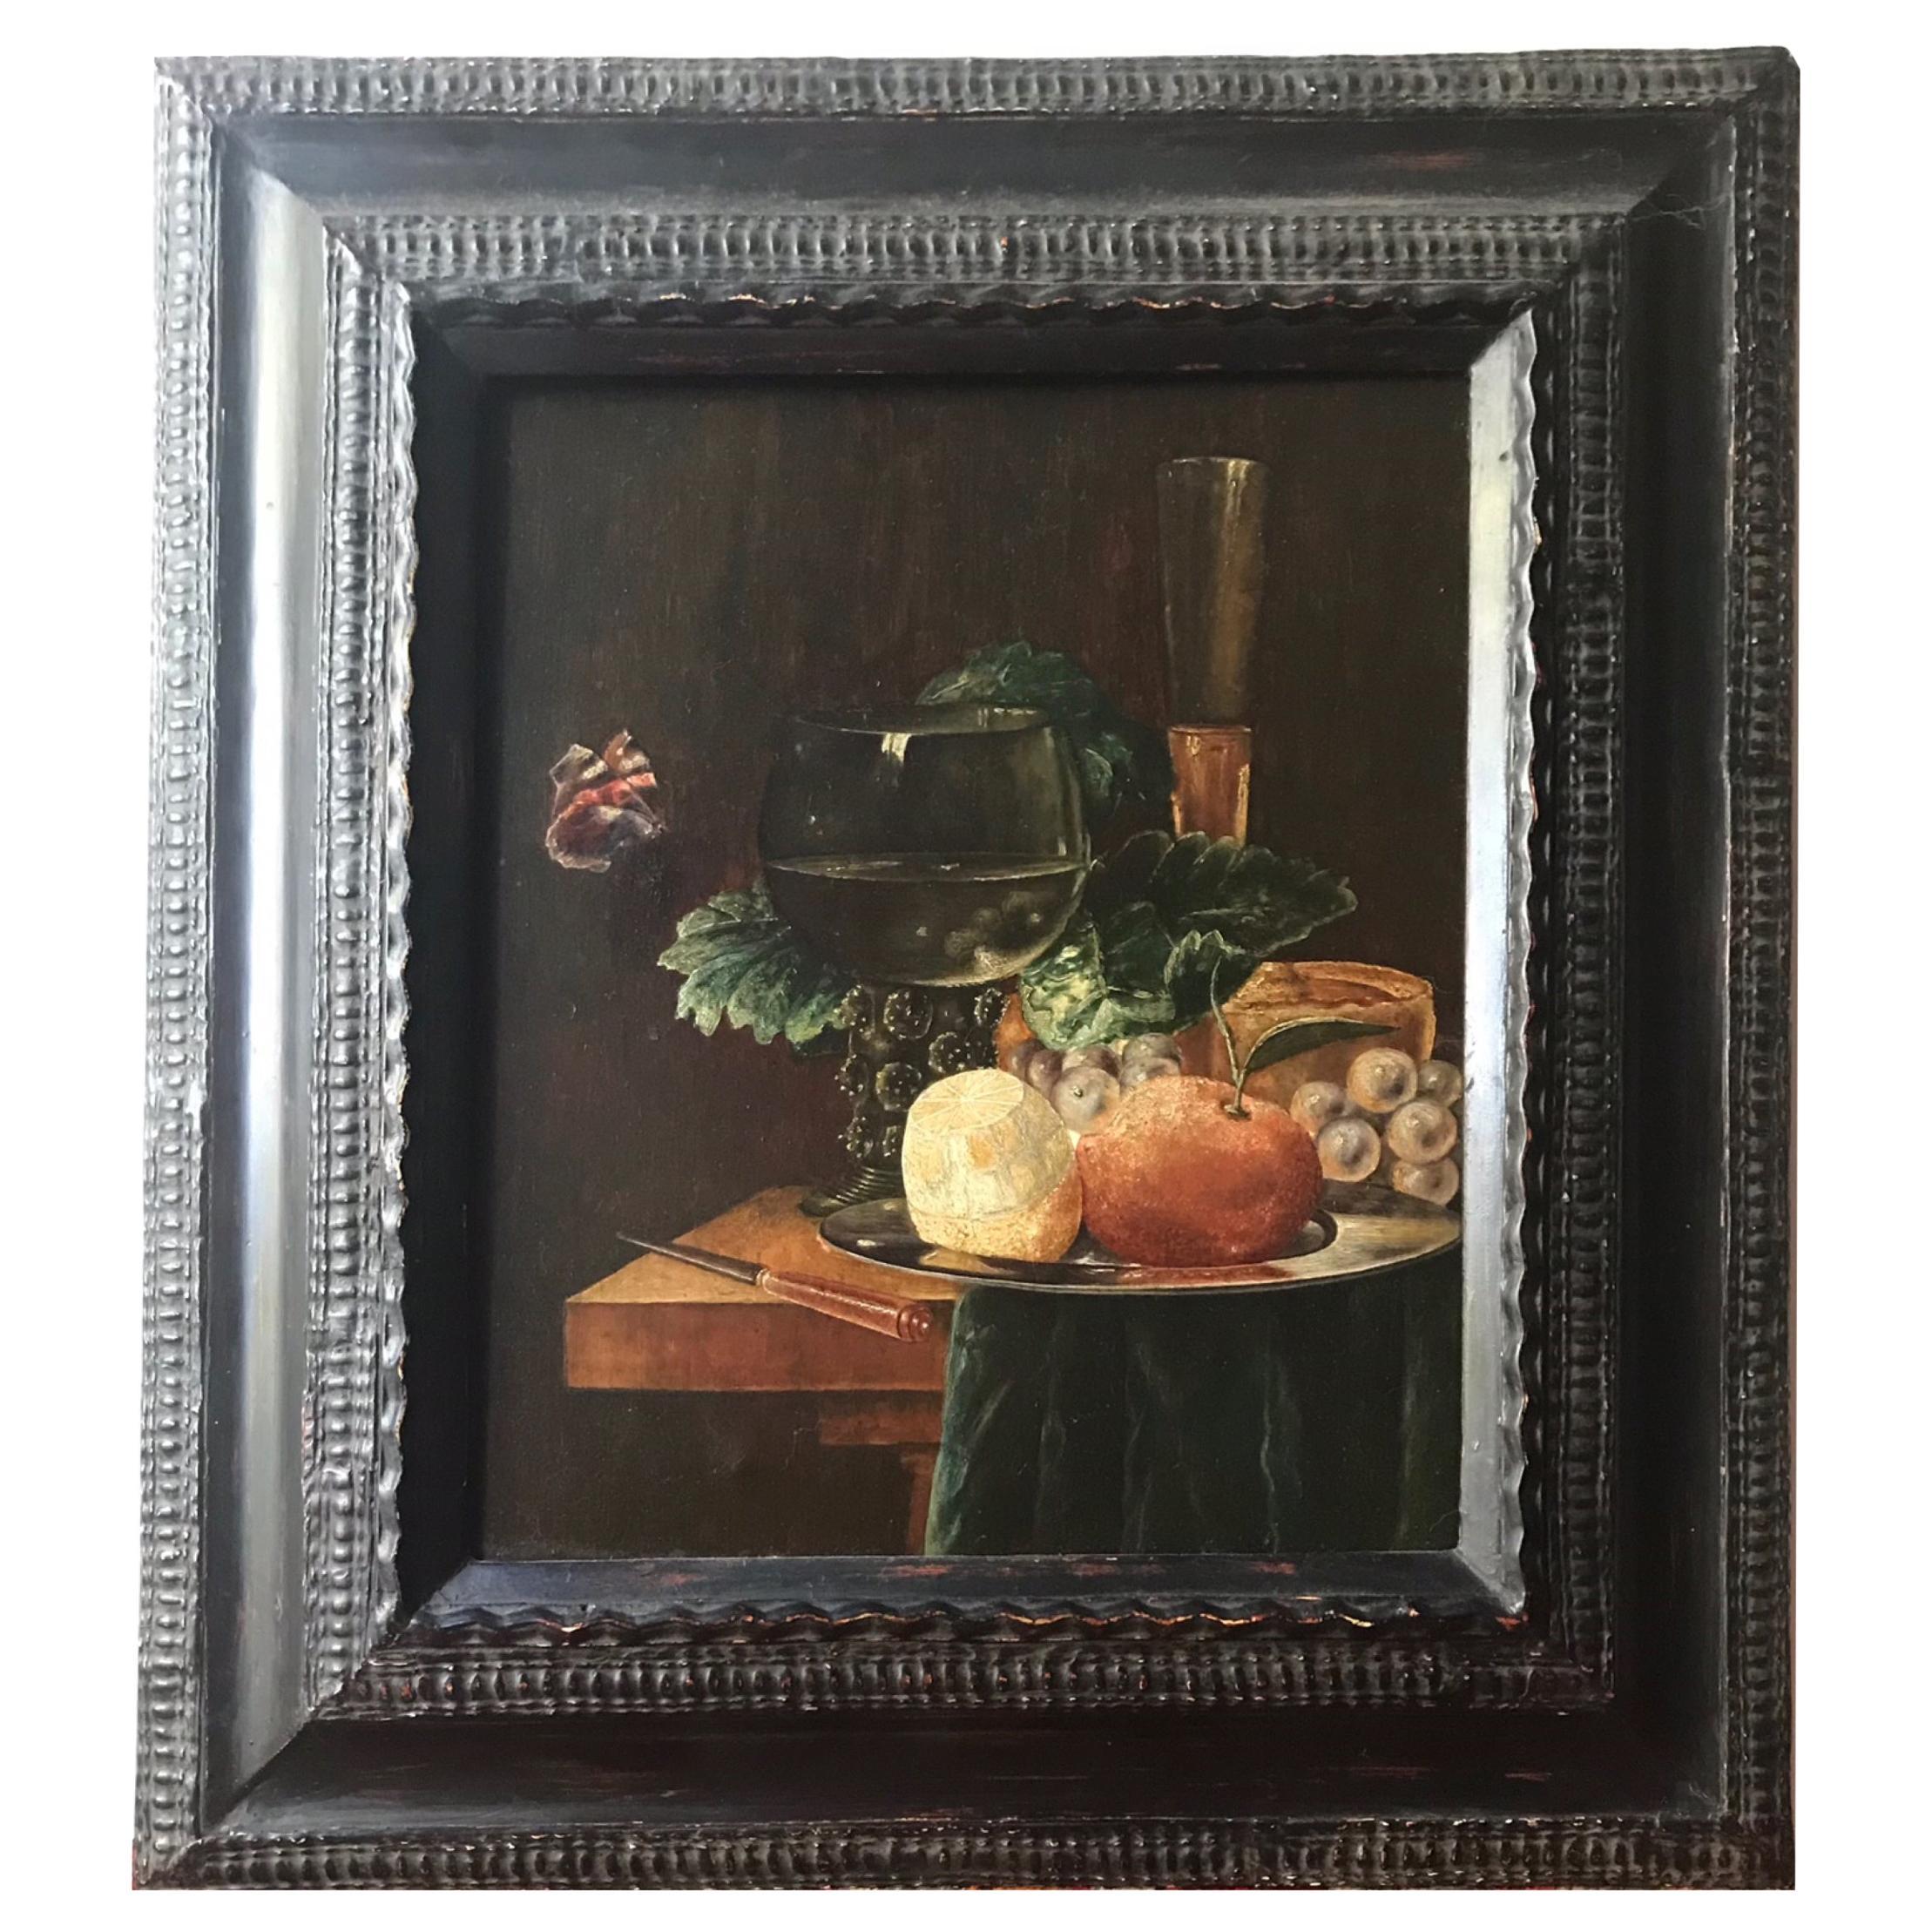 19th Century Still Life Painting After Pieter Claesz Dutch